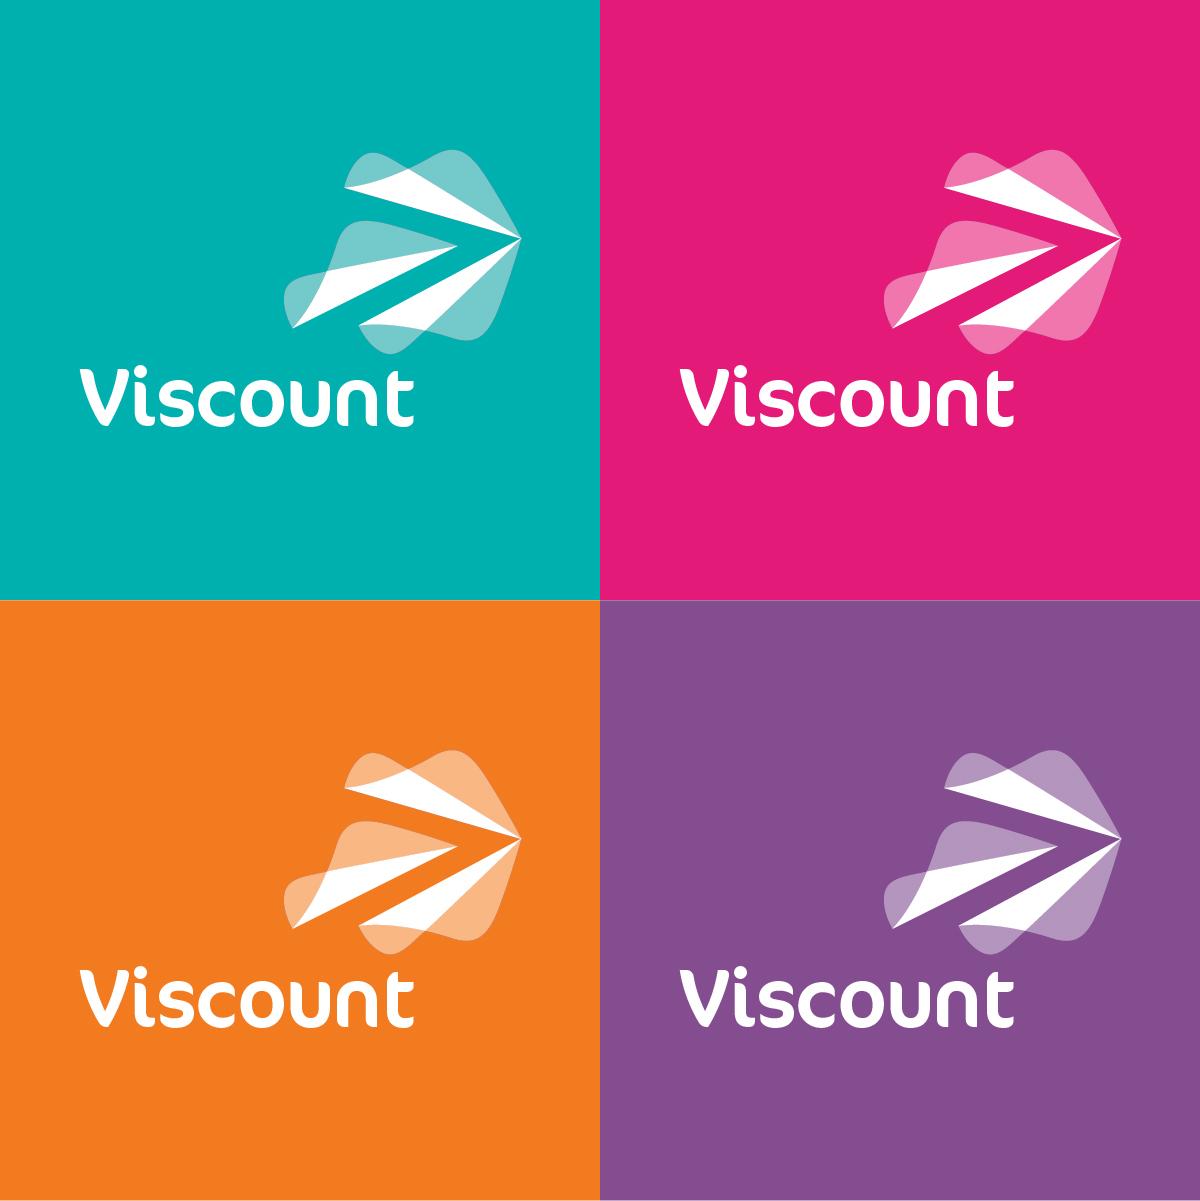 Viscount Plastics Corporate Brand Identity Design